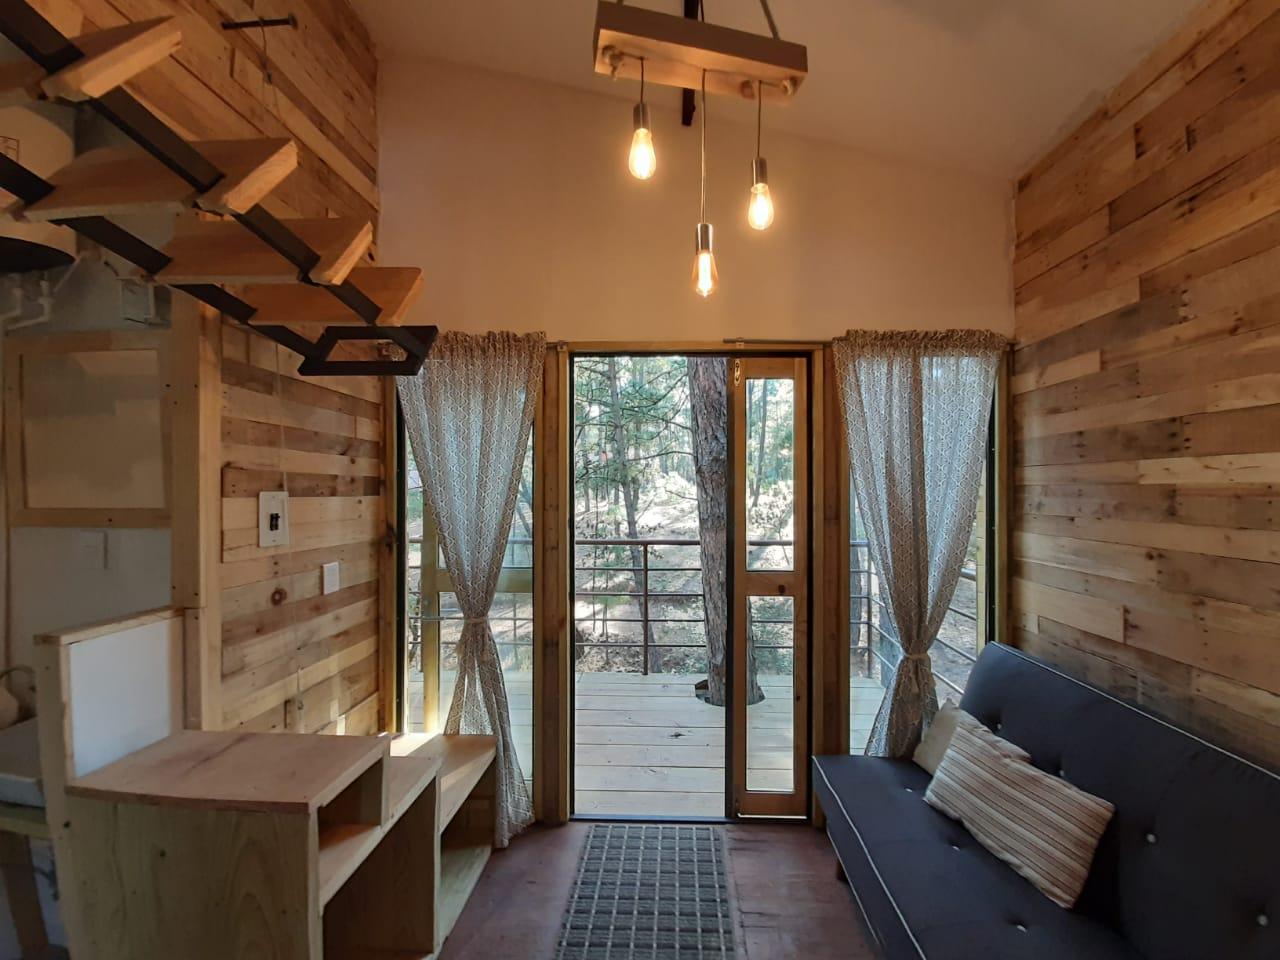 interior_cabaña_huasca_pinochueco